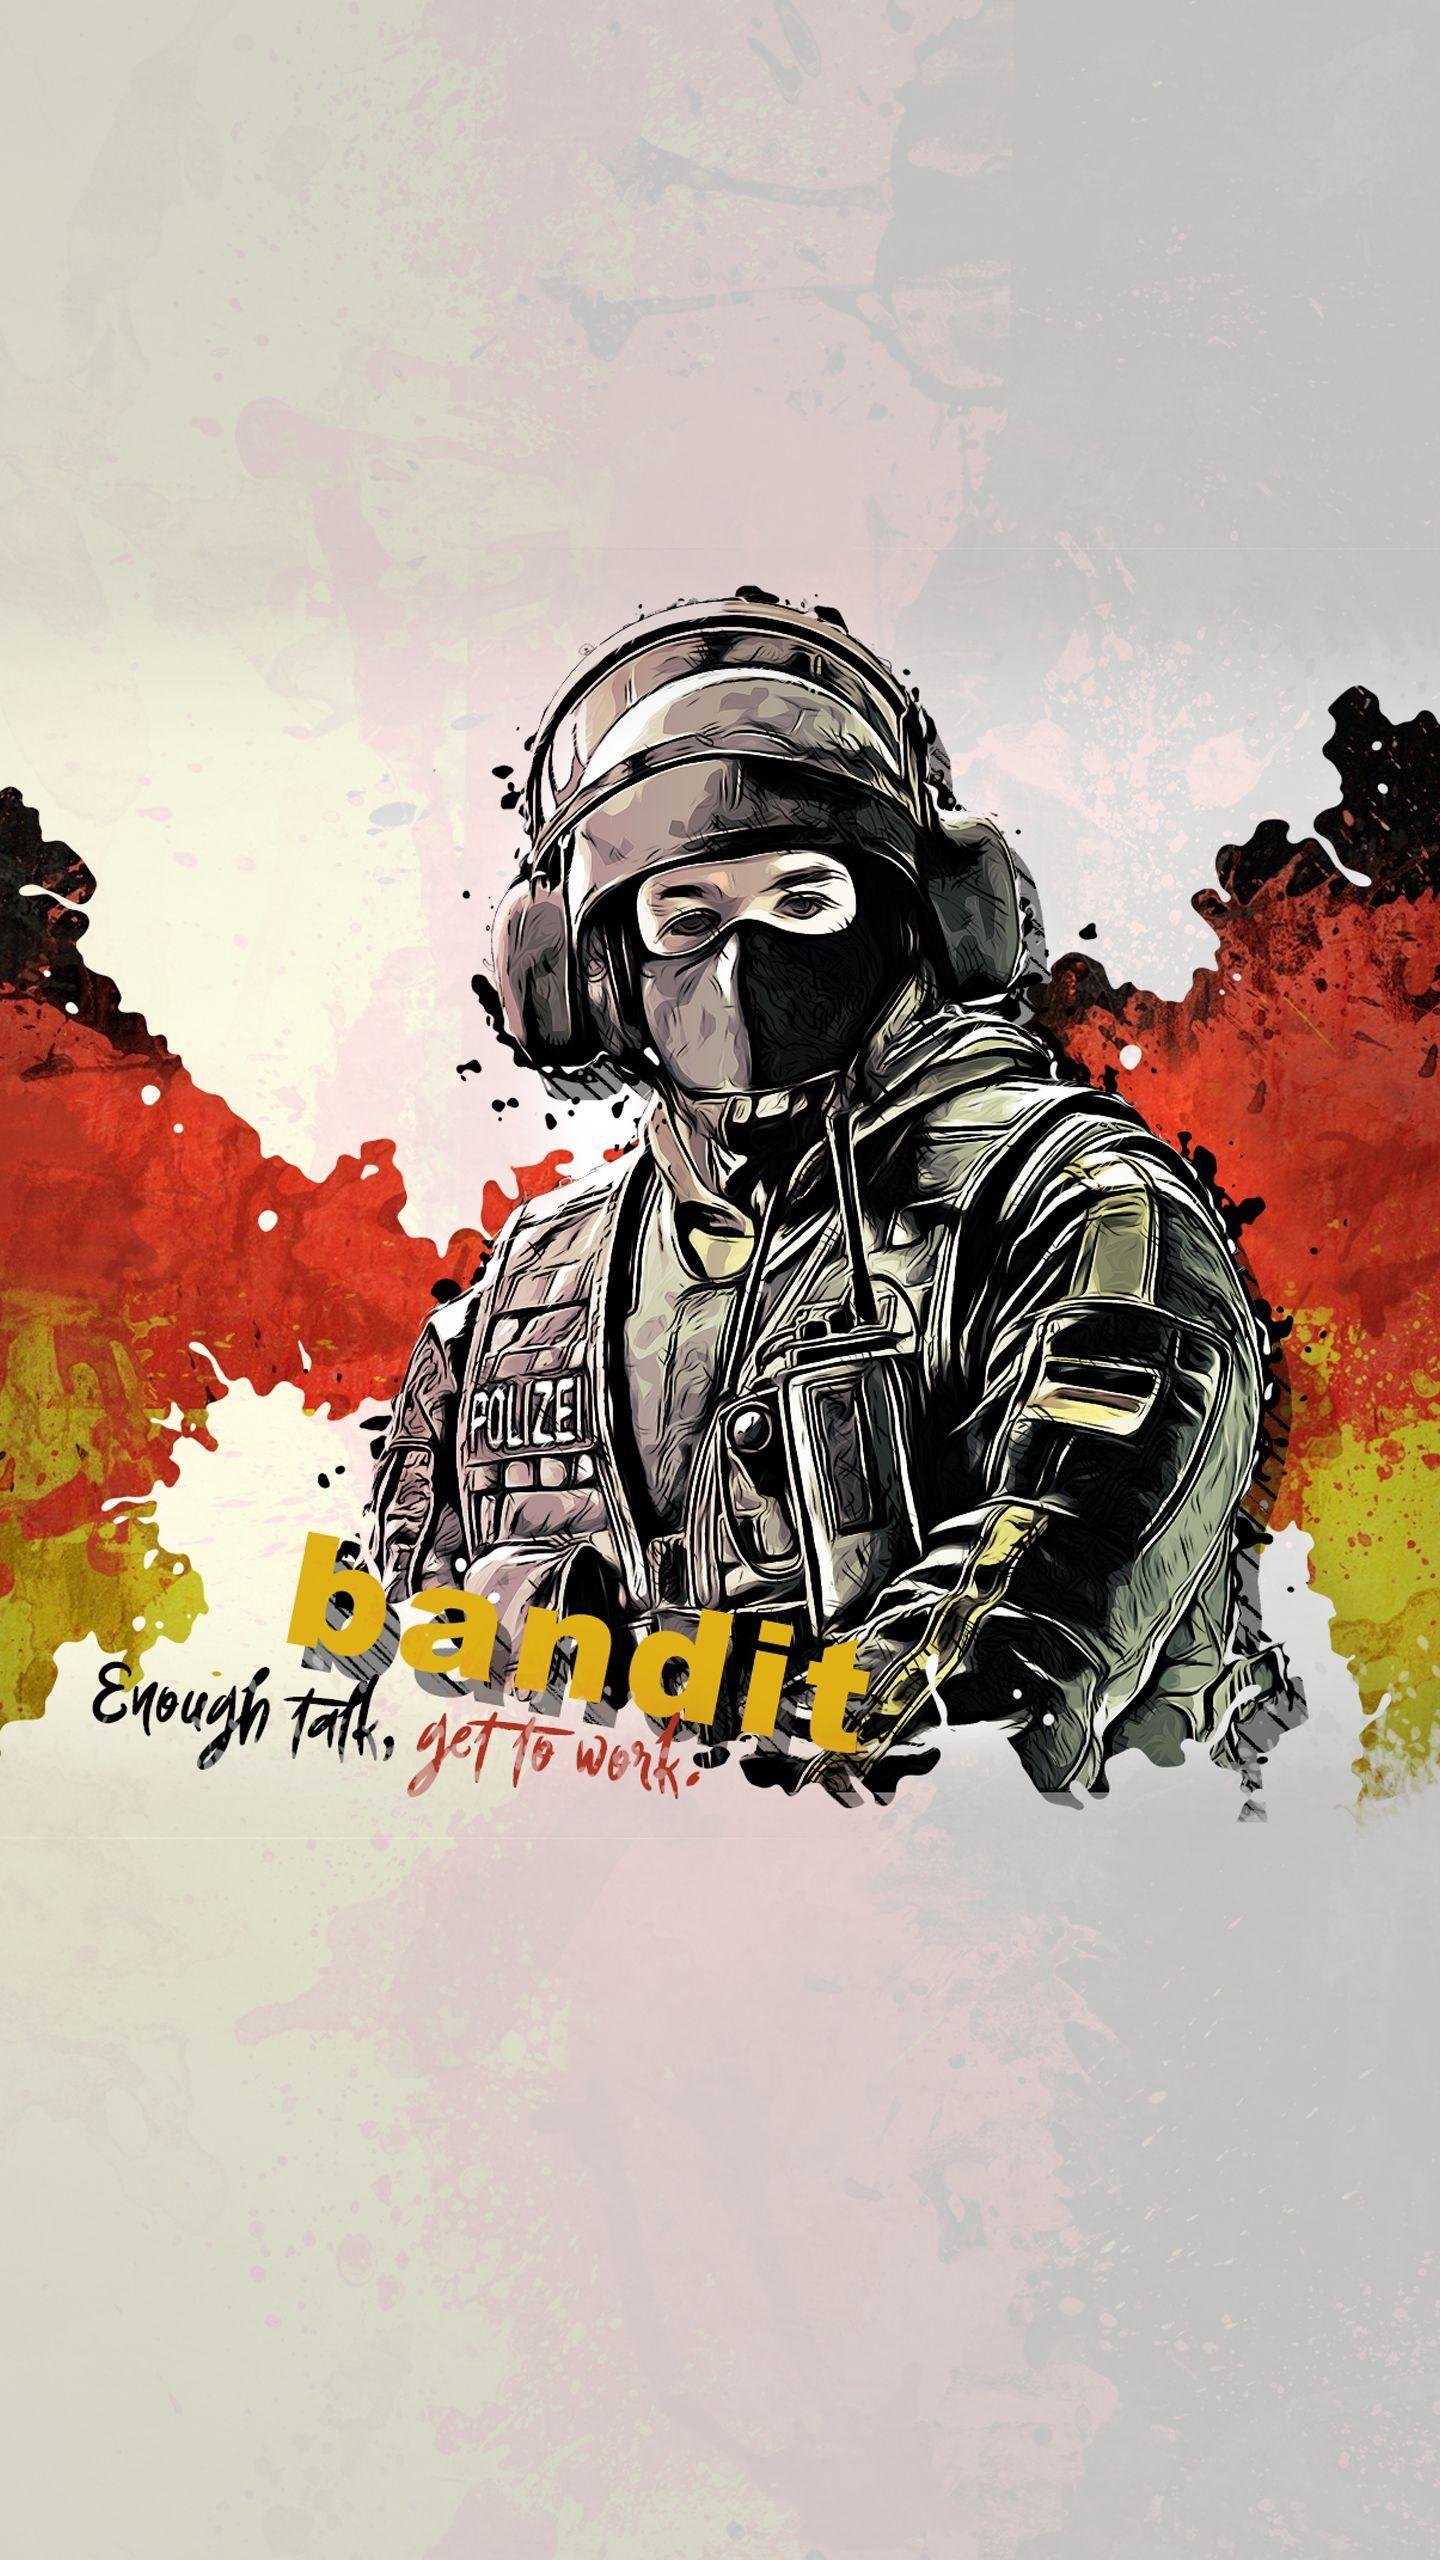 Bandit Rainbow Six Siege Art